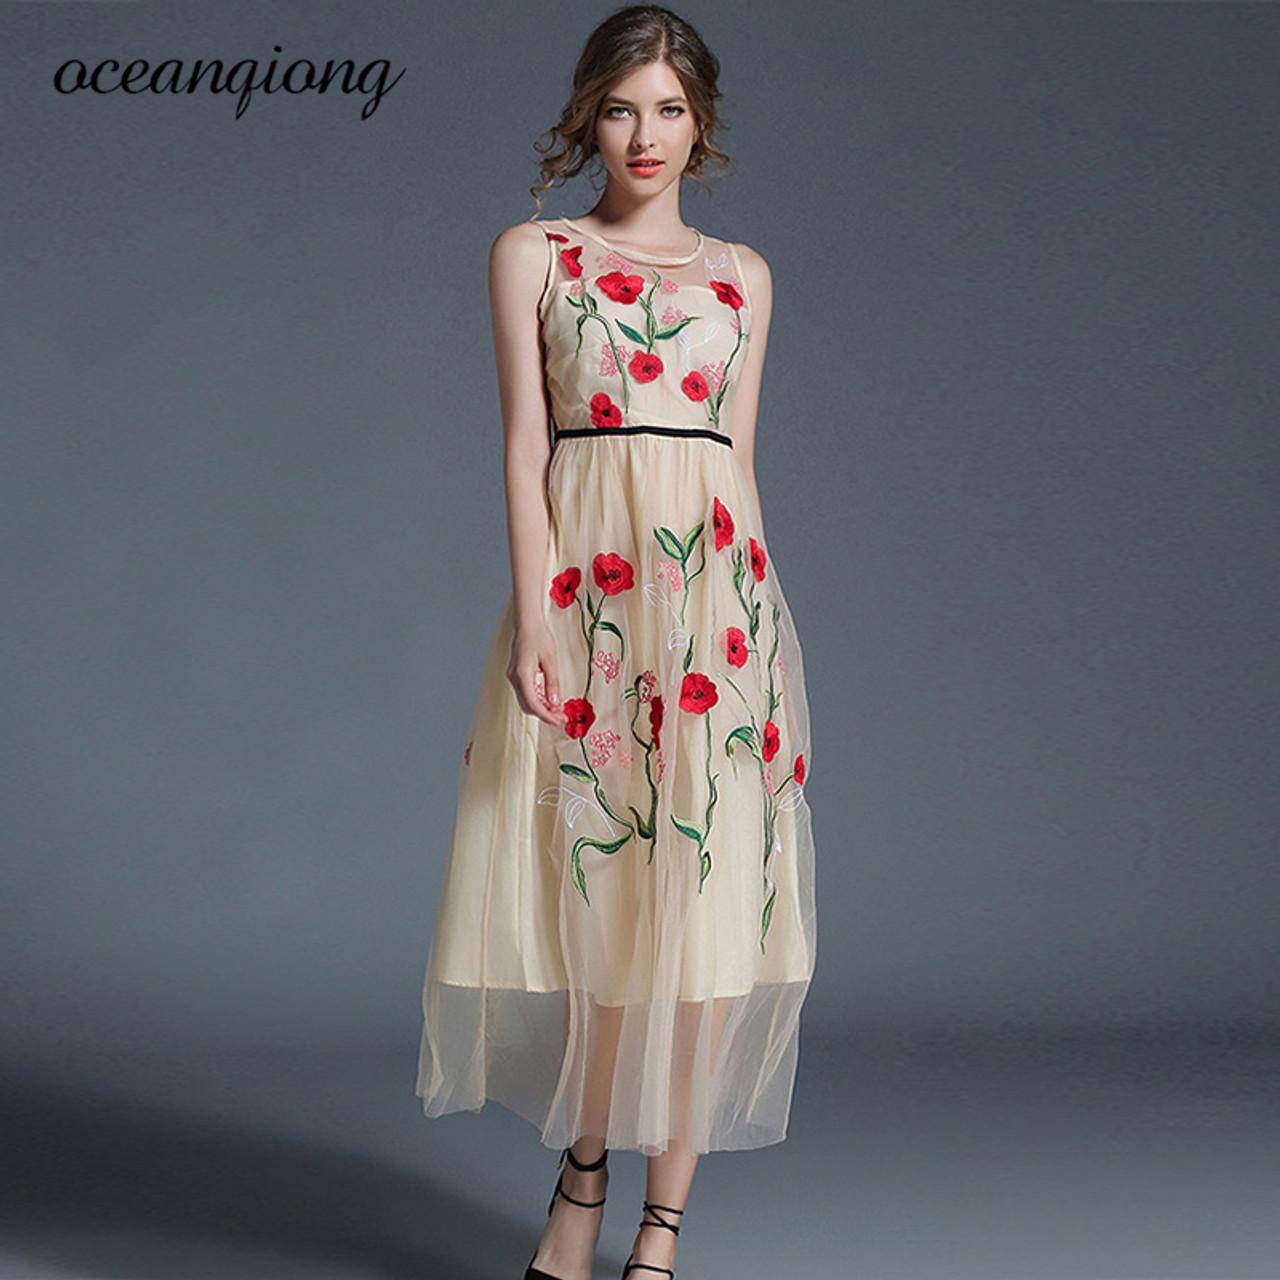 21cbb014d1ee 2018 Long Summer Dresses Newest Fashion Mesh Maxi Dresses Women Elegant  Sleeveless O Neck Flower Floral ...